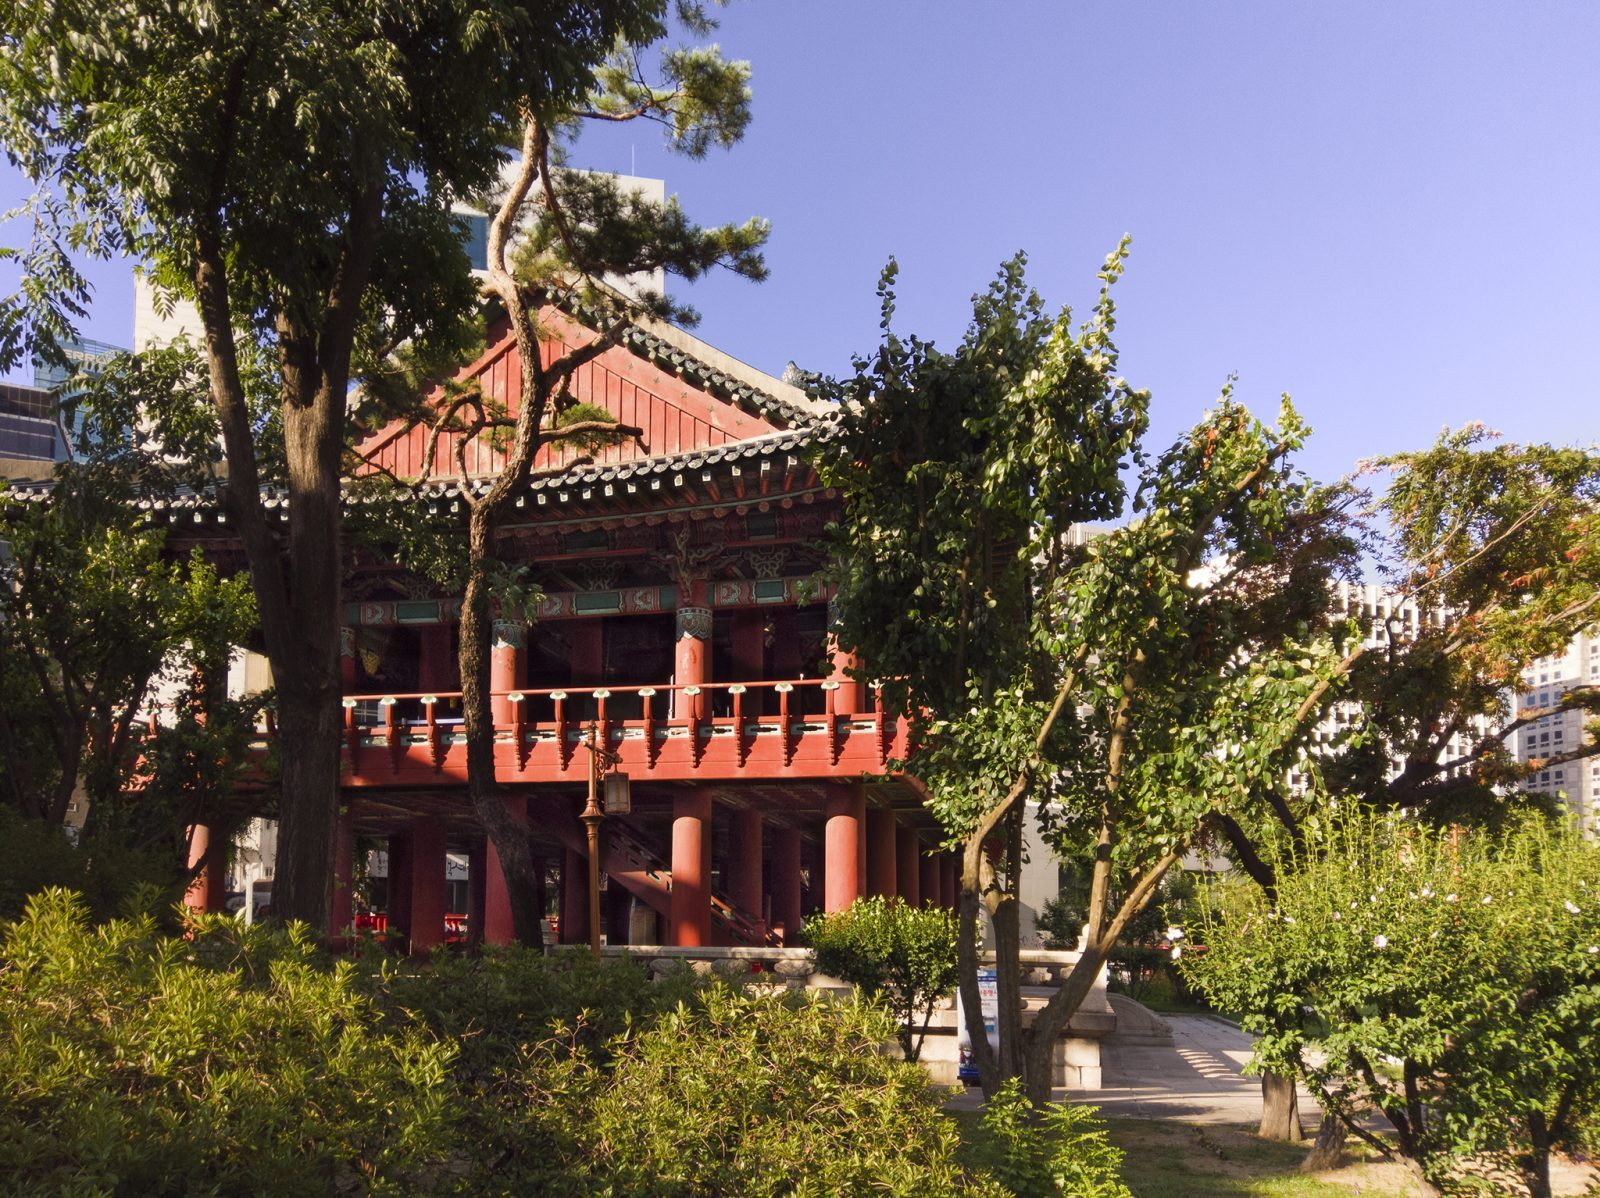 The great bell tower of Bosingak